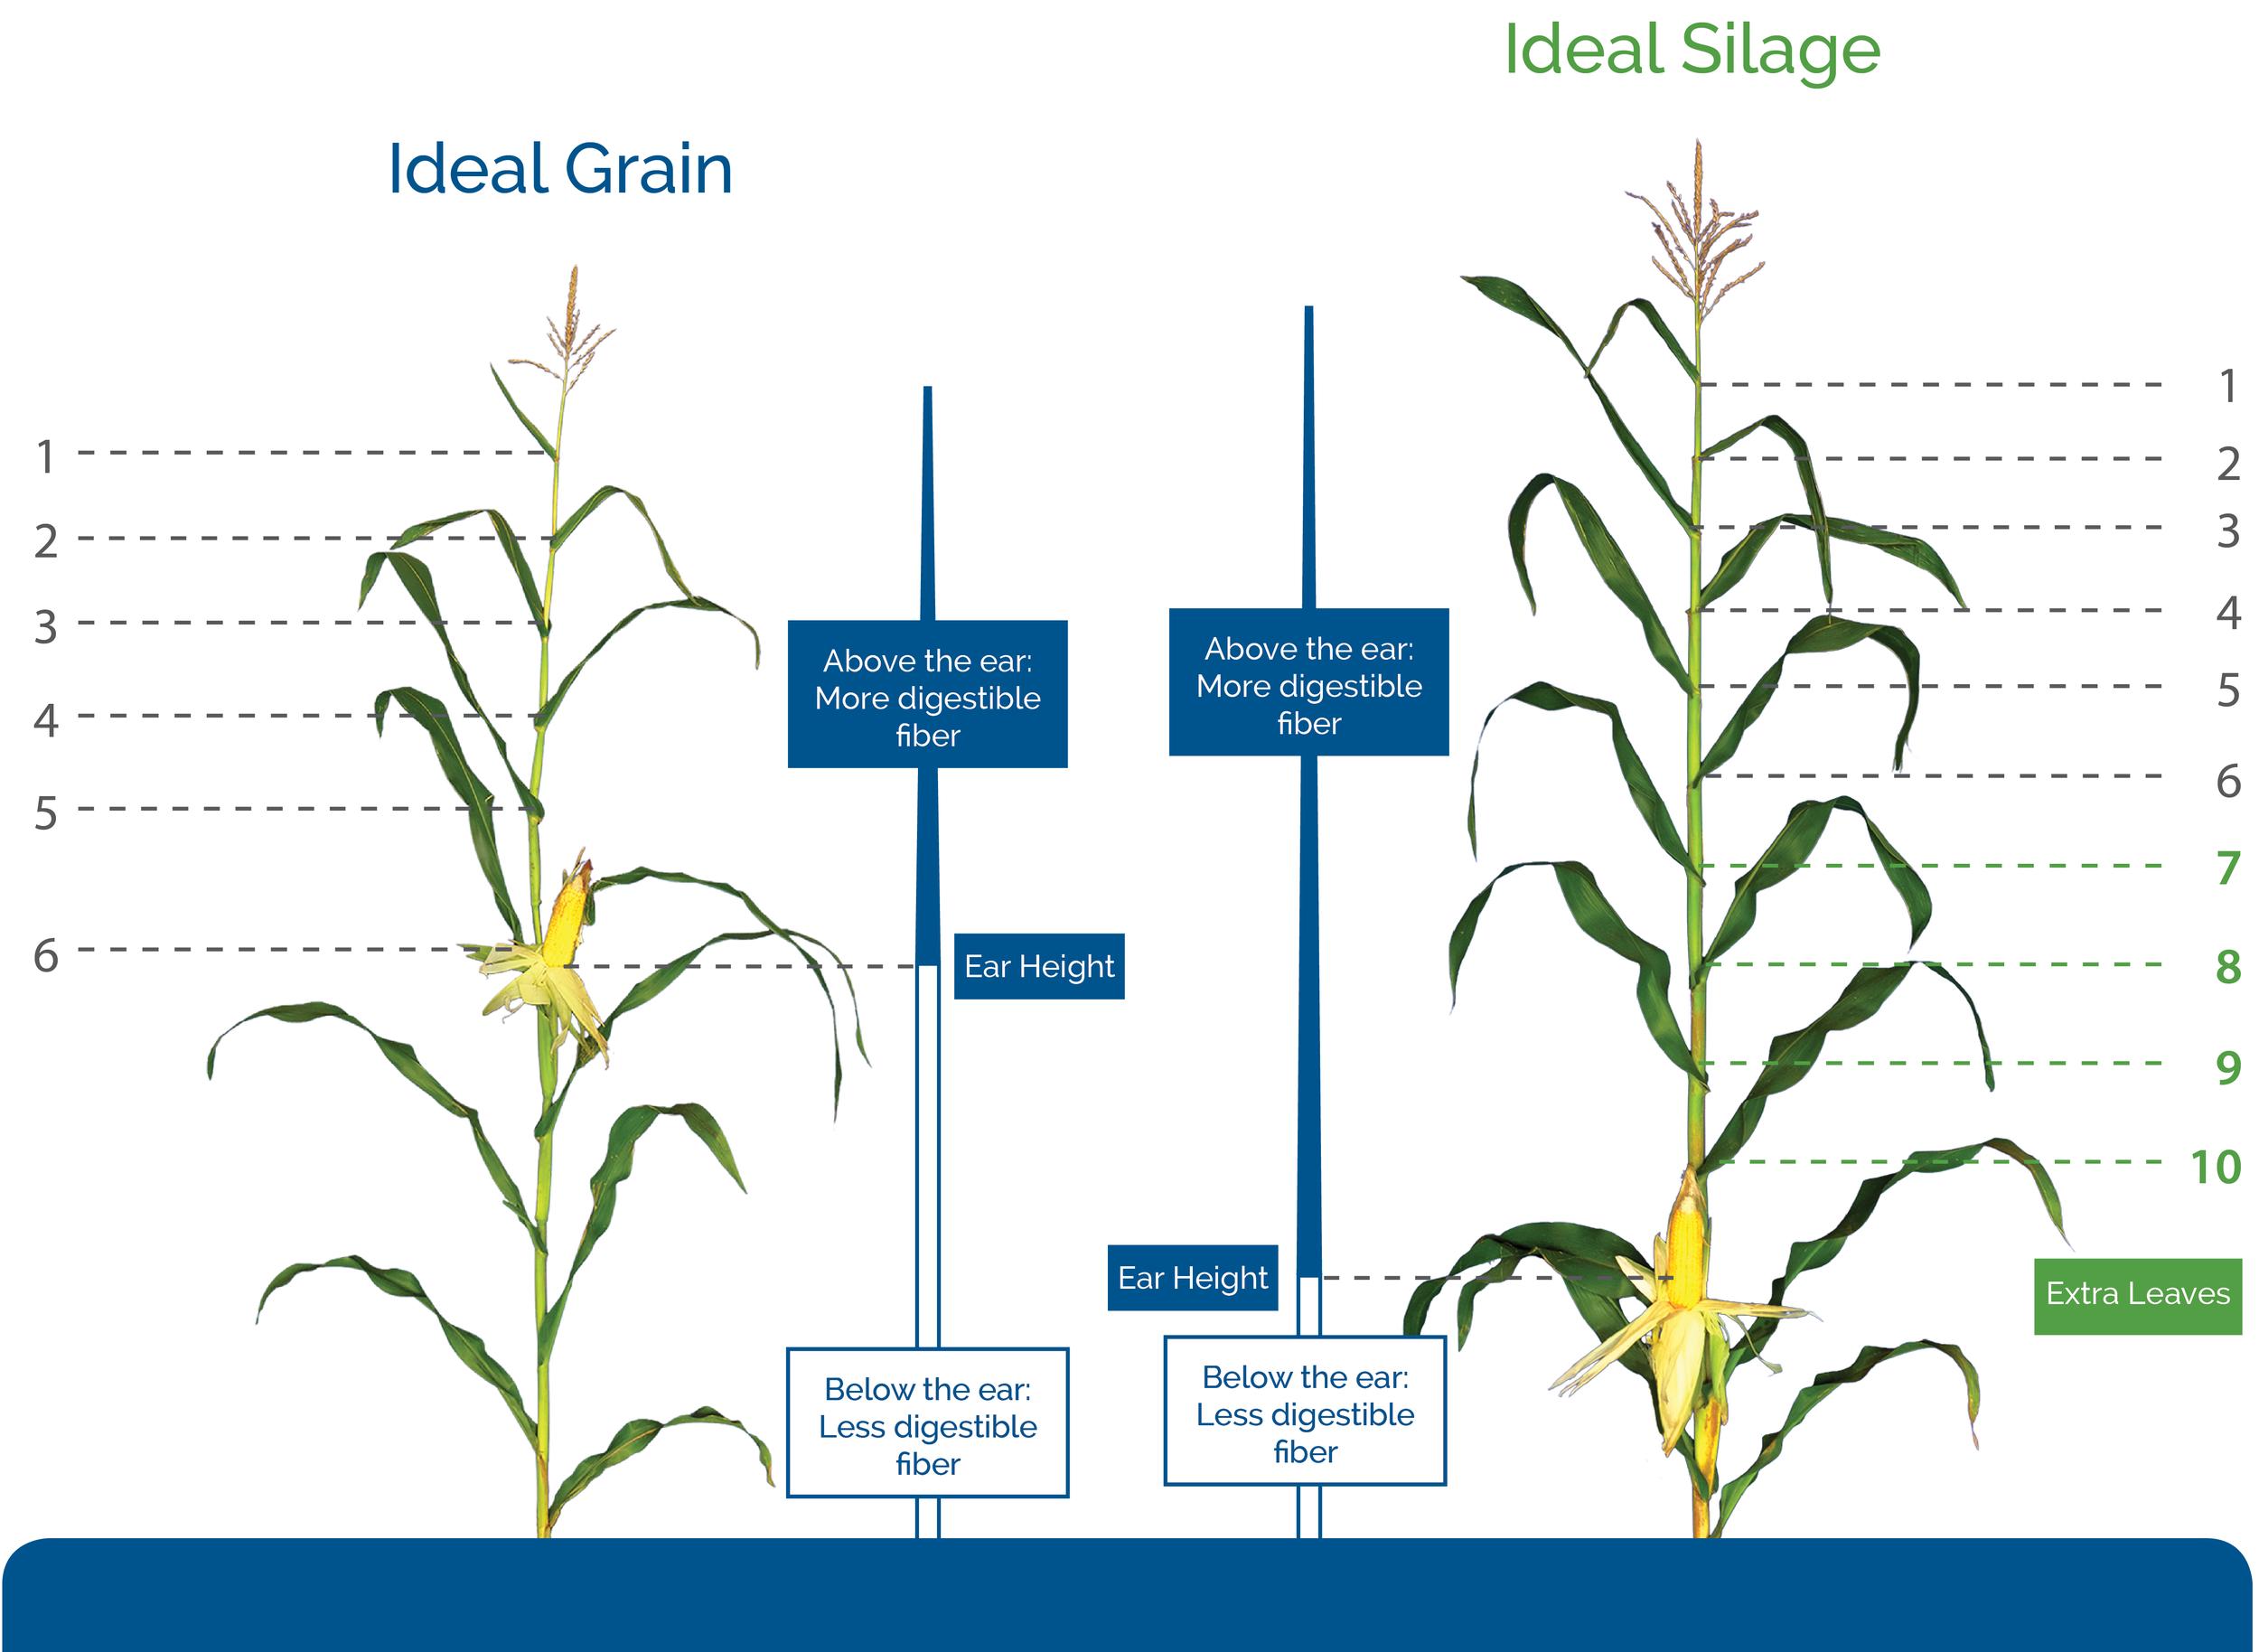 grain-versus-silage-corn-hybrids.jpg